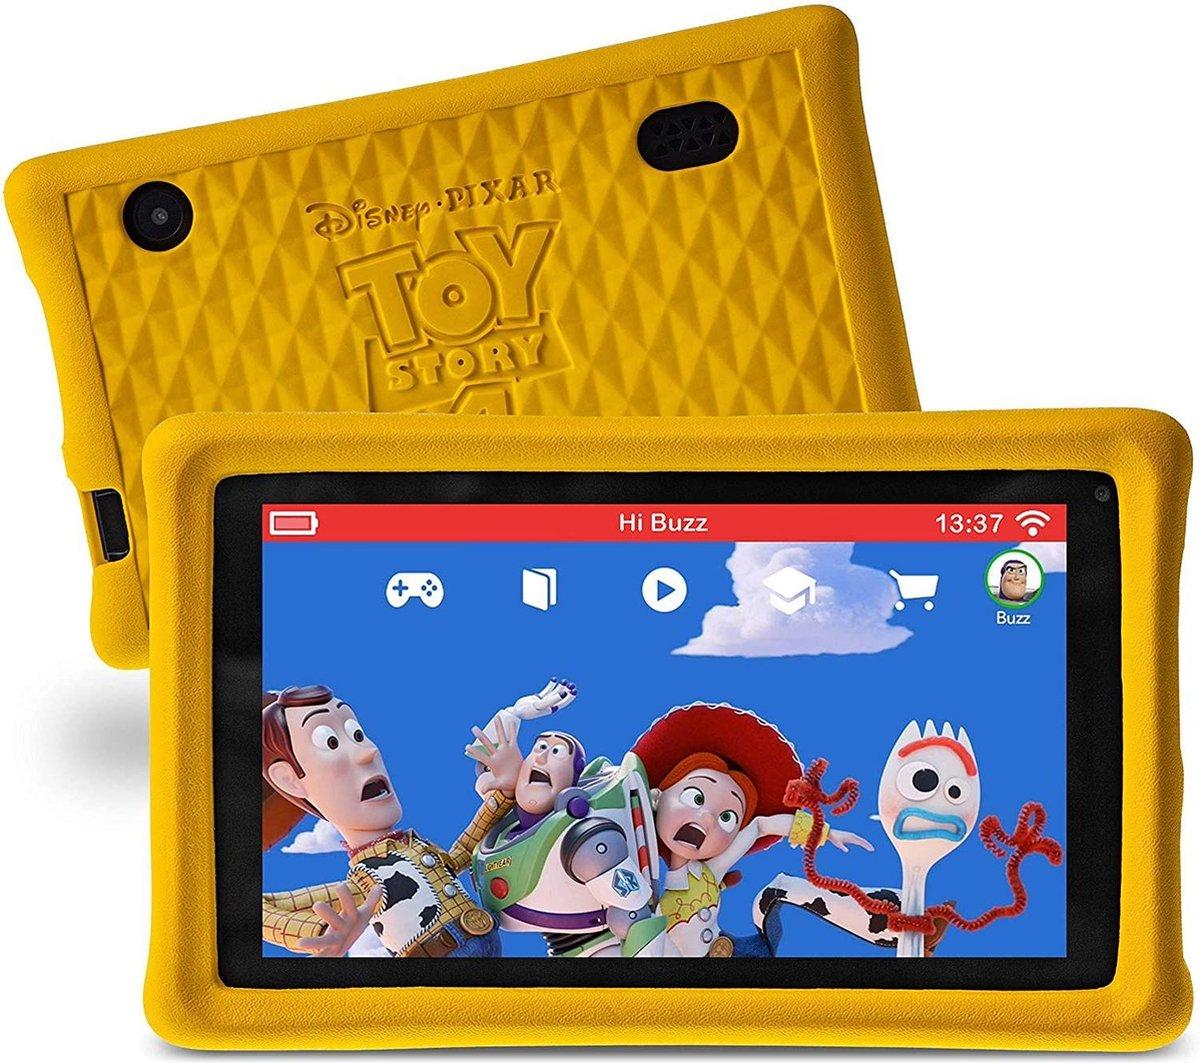 Pebble Gear Kindertablet Disney Toy Story Set Draagtas- 7 inch – 1GB – Android 8.1- 500 spelletjes – Ouderlijk toezicht